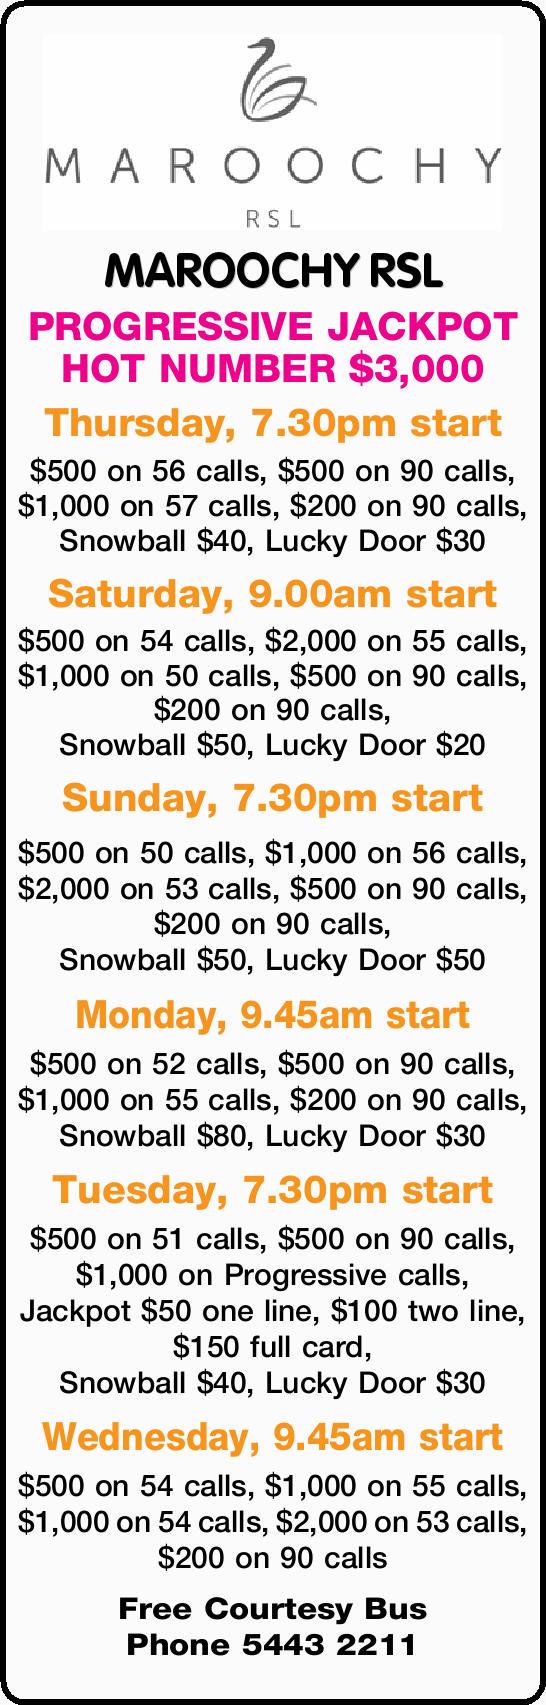 PROGRESSIVE JACKPOT HOT NUMBER $3,000 Thursday, 7.30pm start $500 on 56 calls, $500 on 90 calls,...